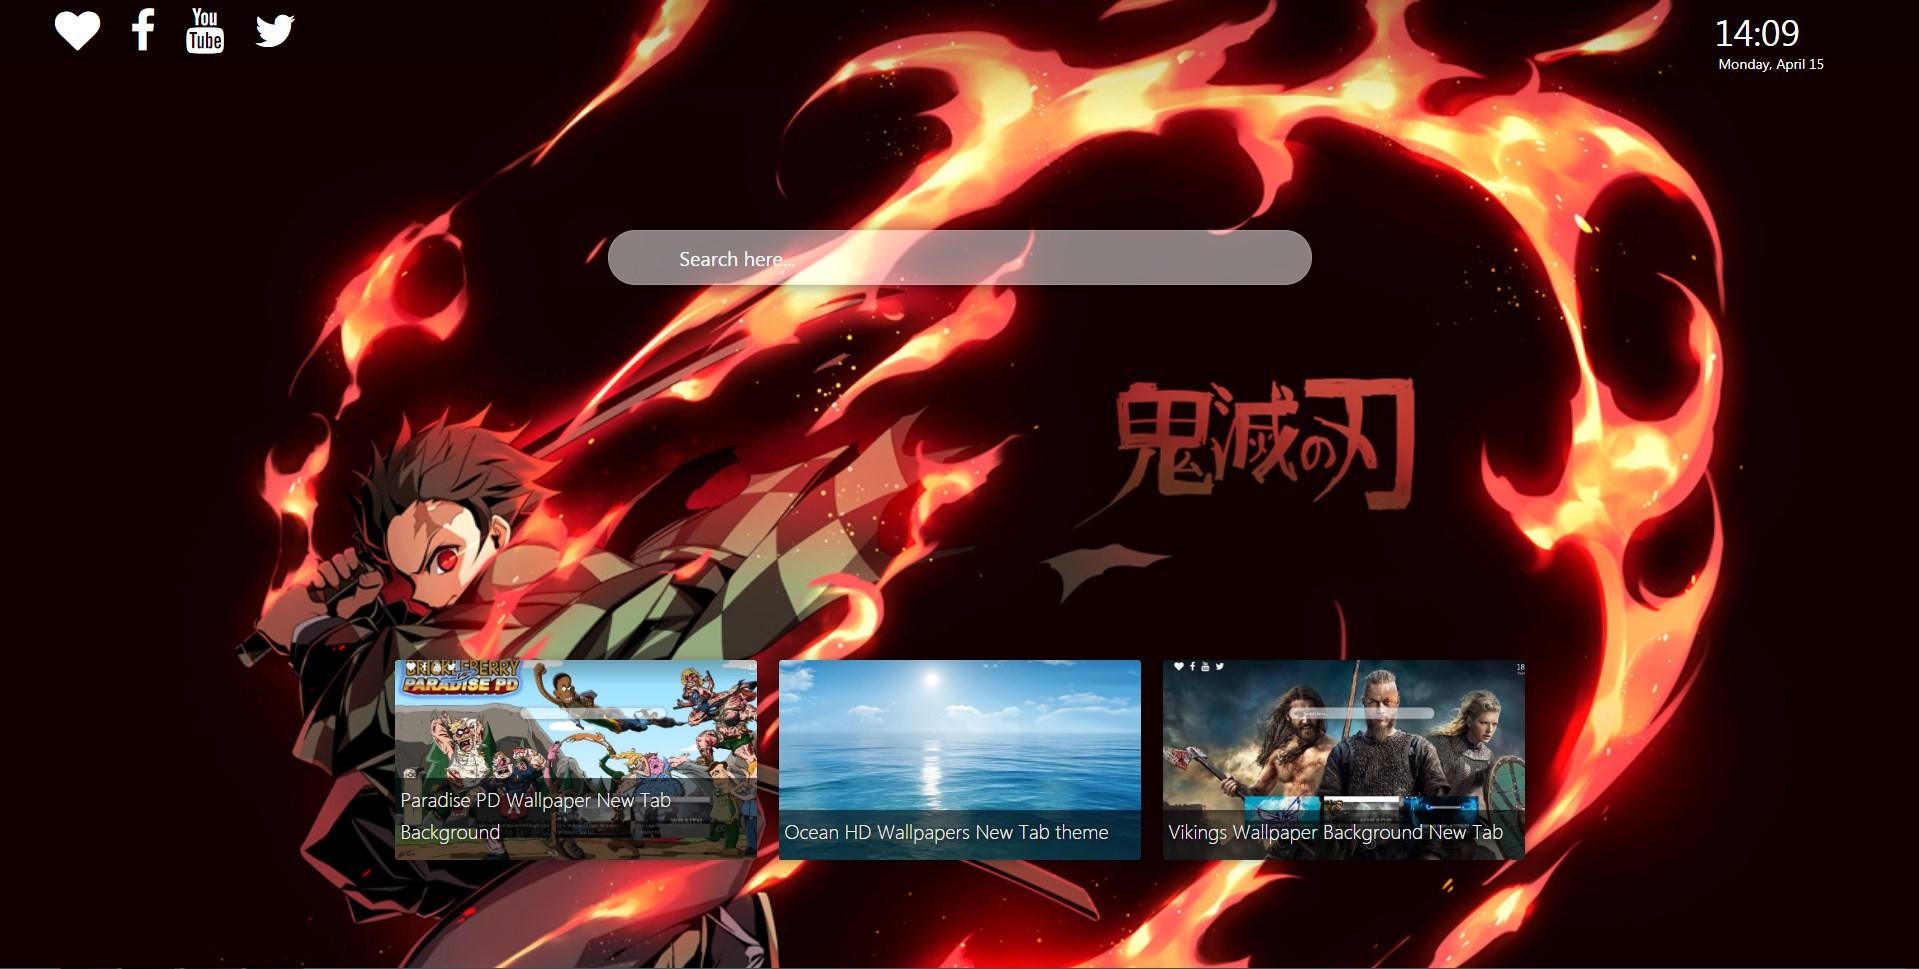 Download Kimetsu No Yaiba Wallpaper Hd Backgrounds Download Itl Cat